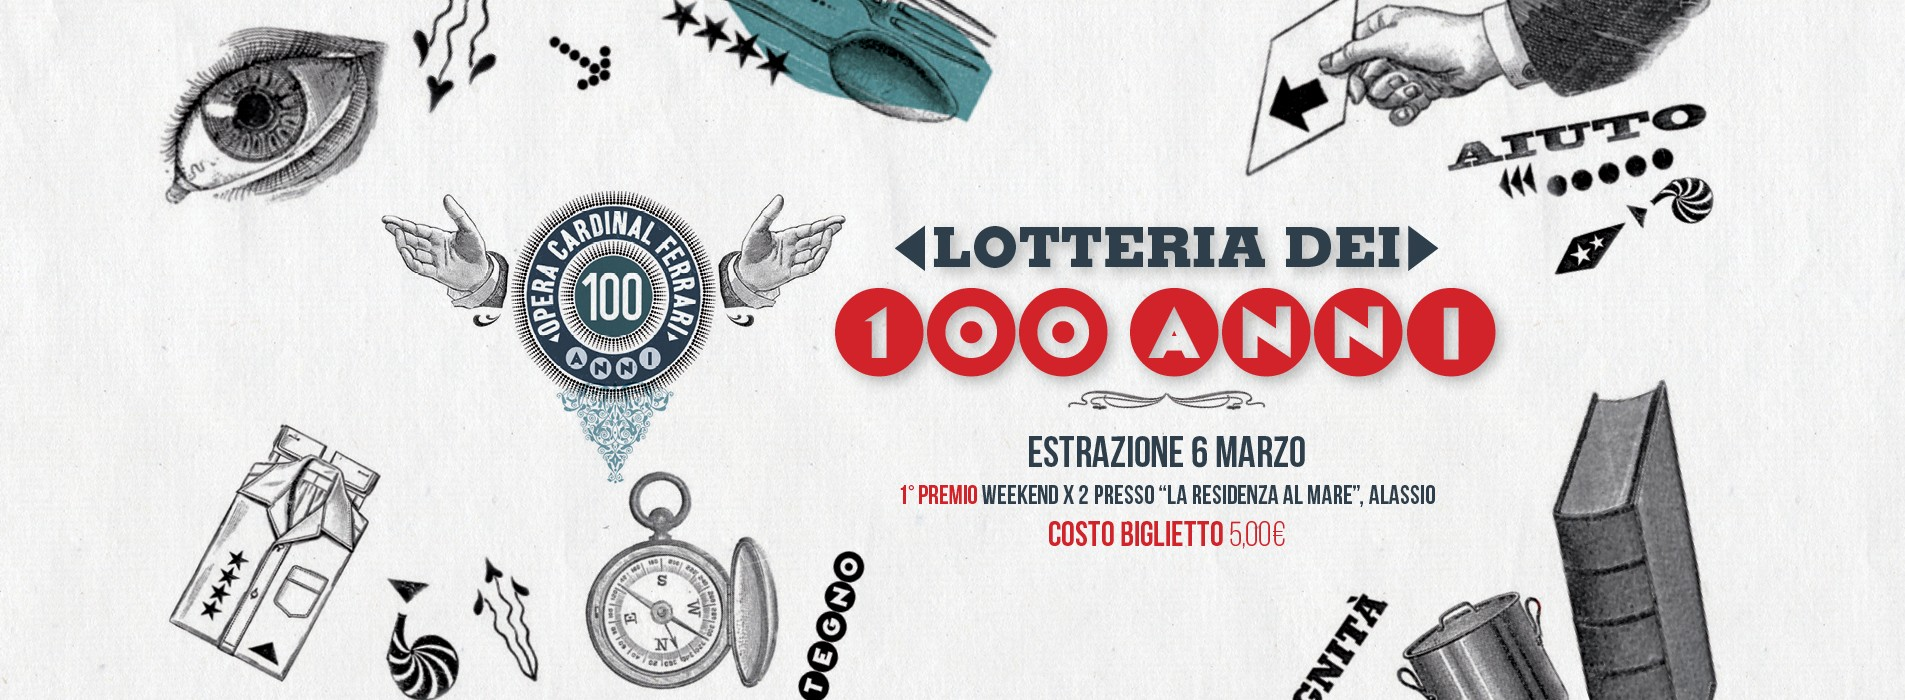 LOTTERIA DEI 100 ANNI 1921- 2021-OPERA CARDINAL FERRARI